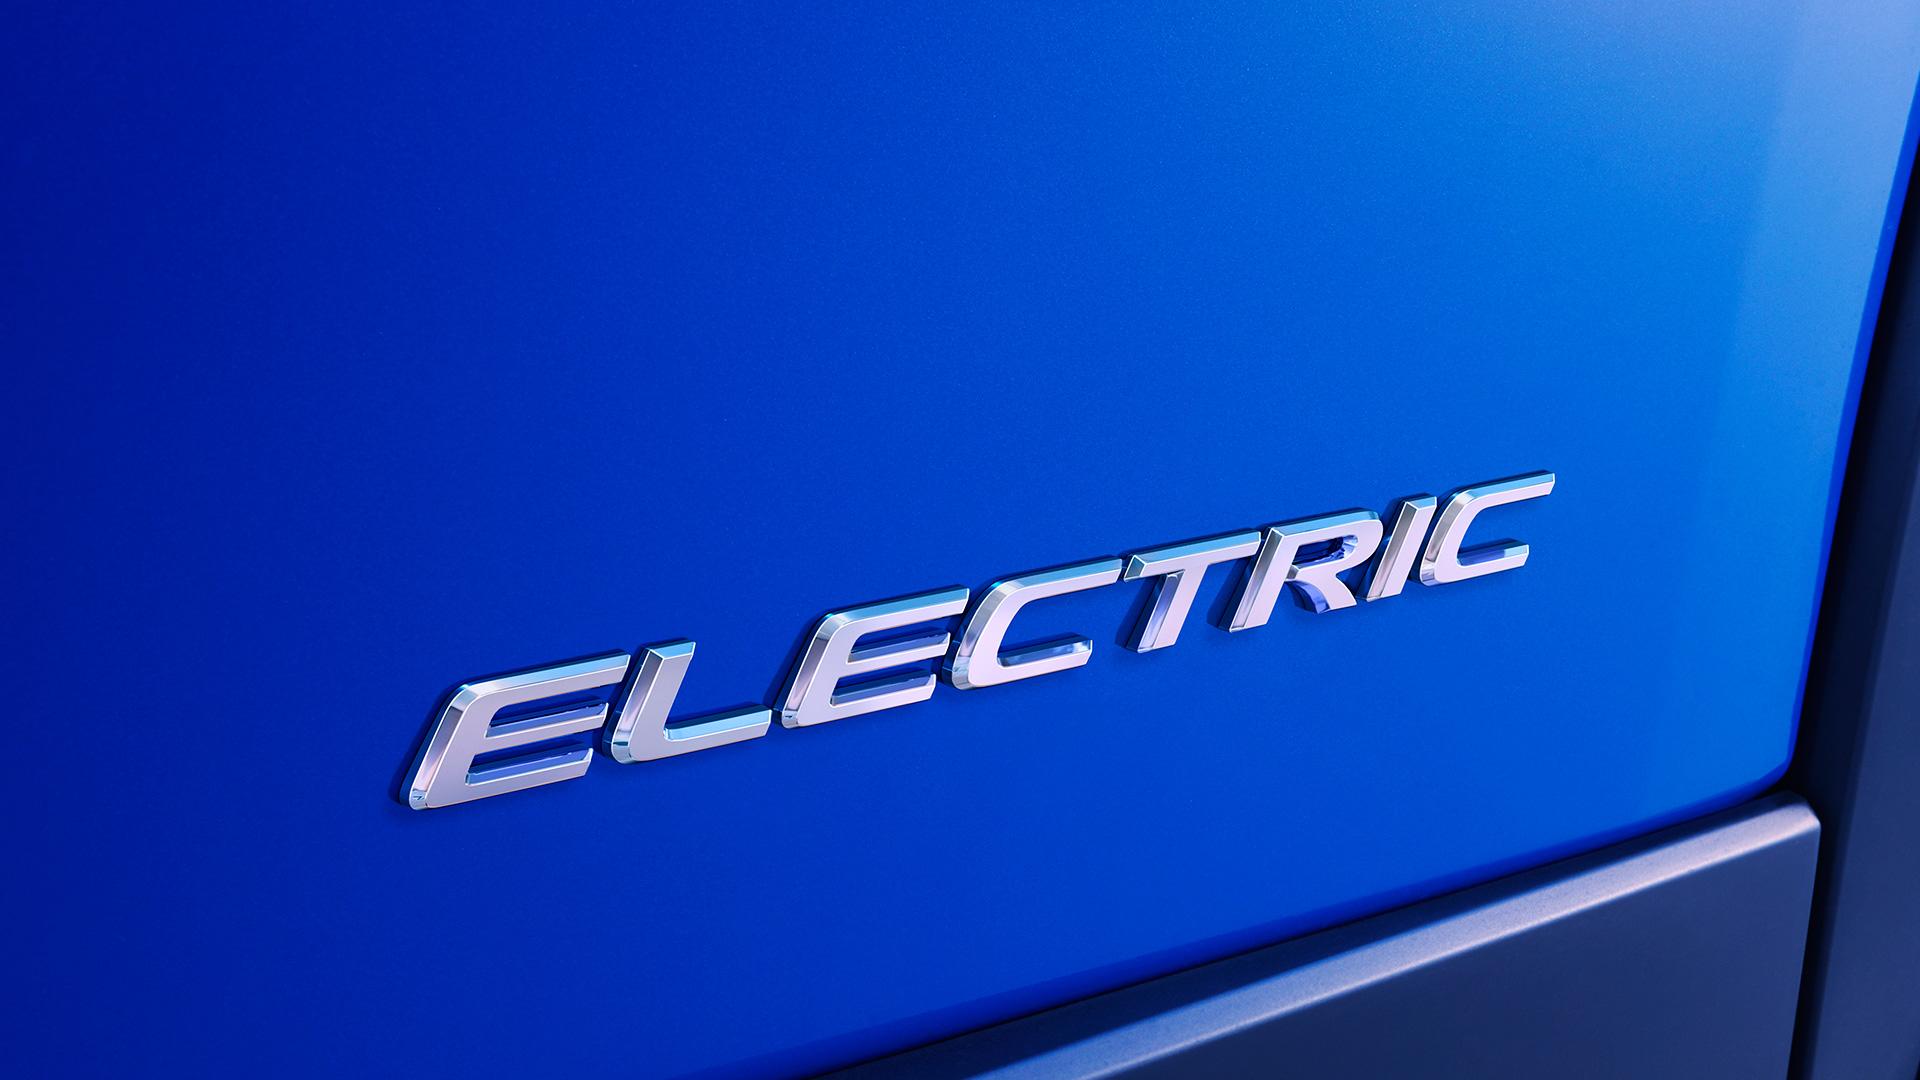 H Lexus θα παρουσιάσει φέτος μοντέλο με Επιπέδου 2